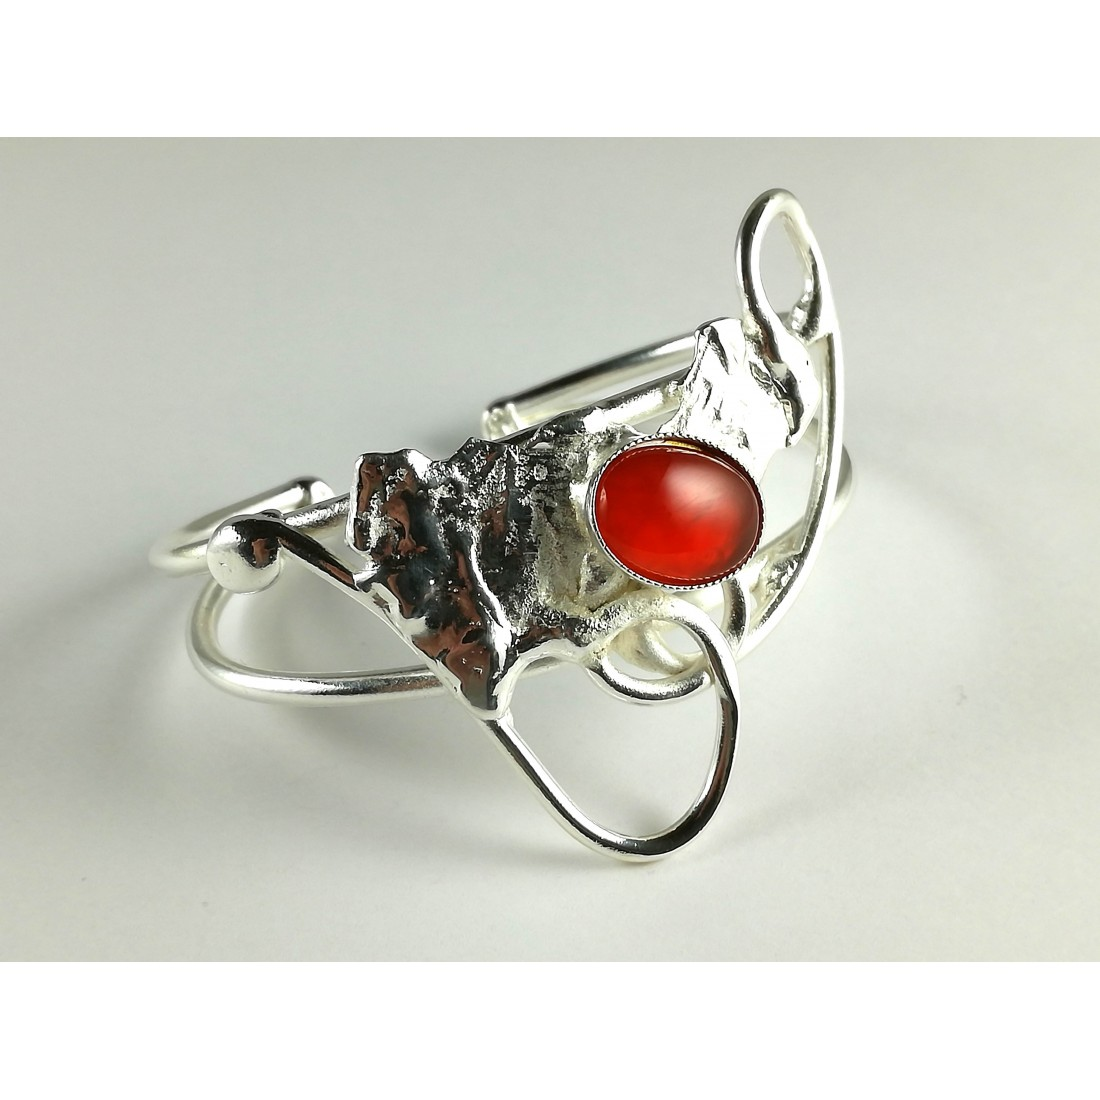 Bijou artisanal-bracelet rigide avec la cornaline